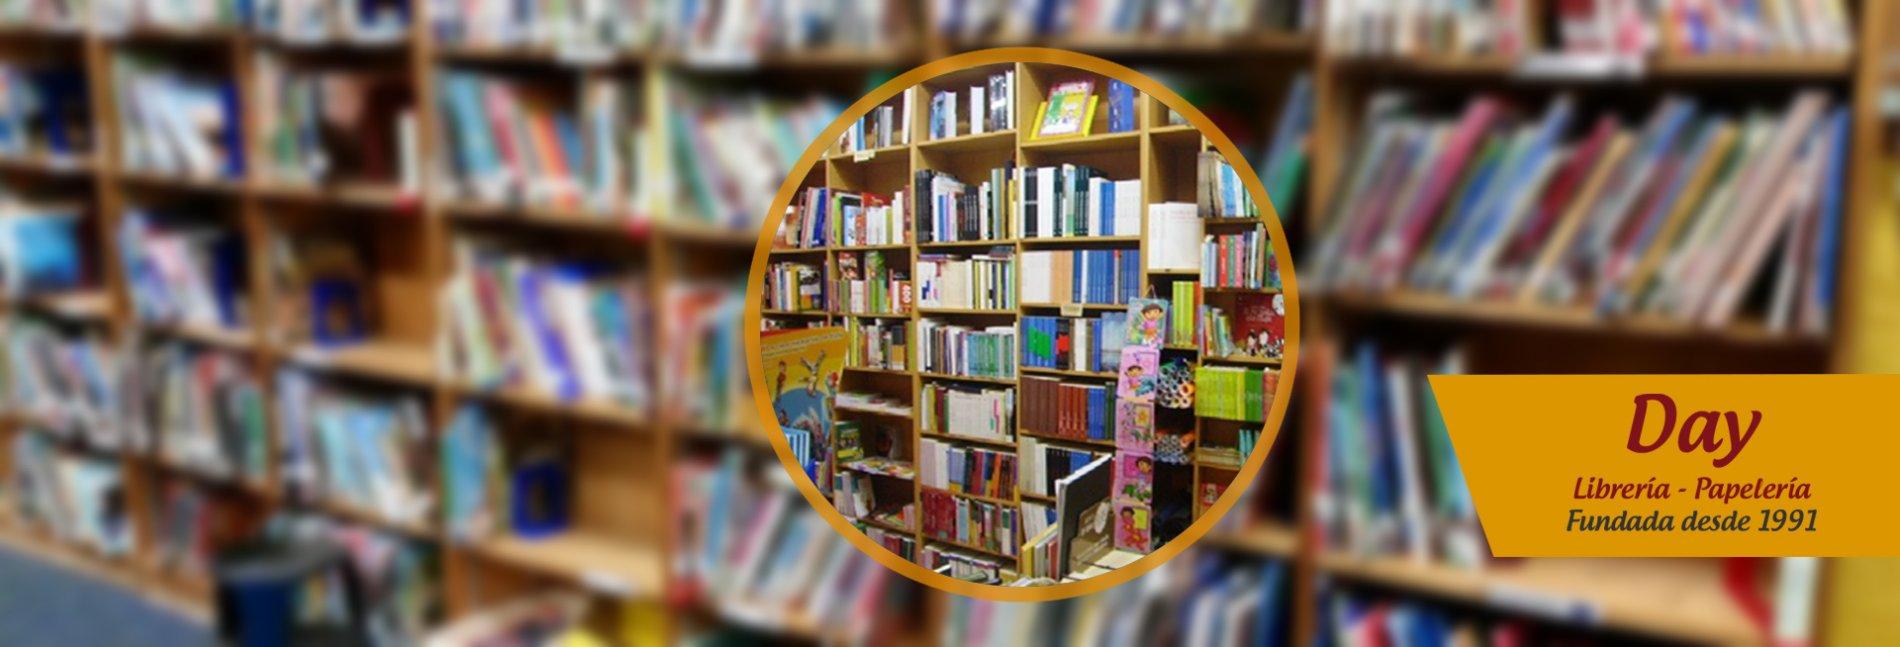 libreriaday